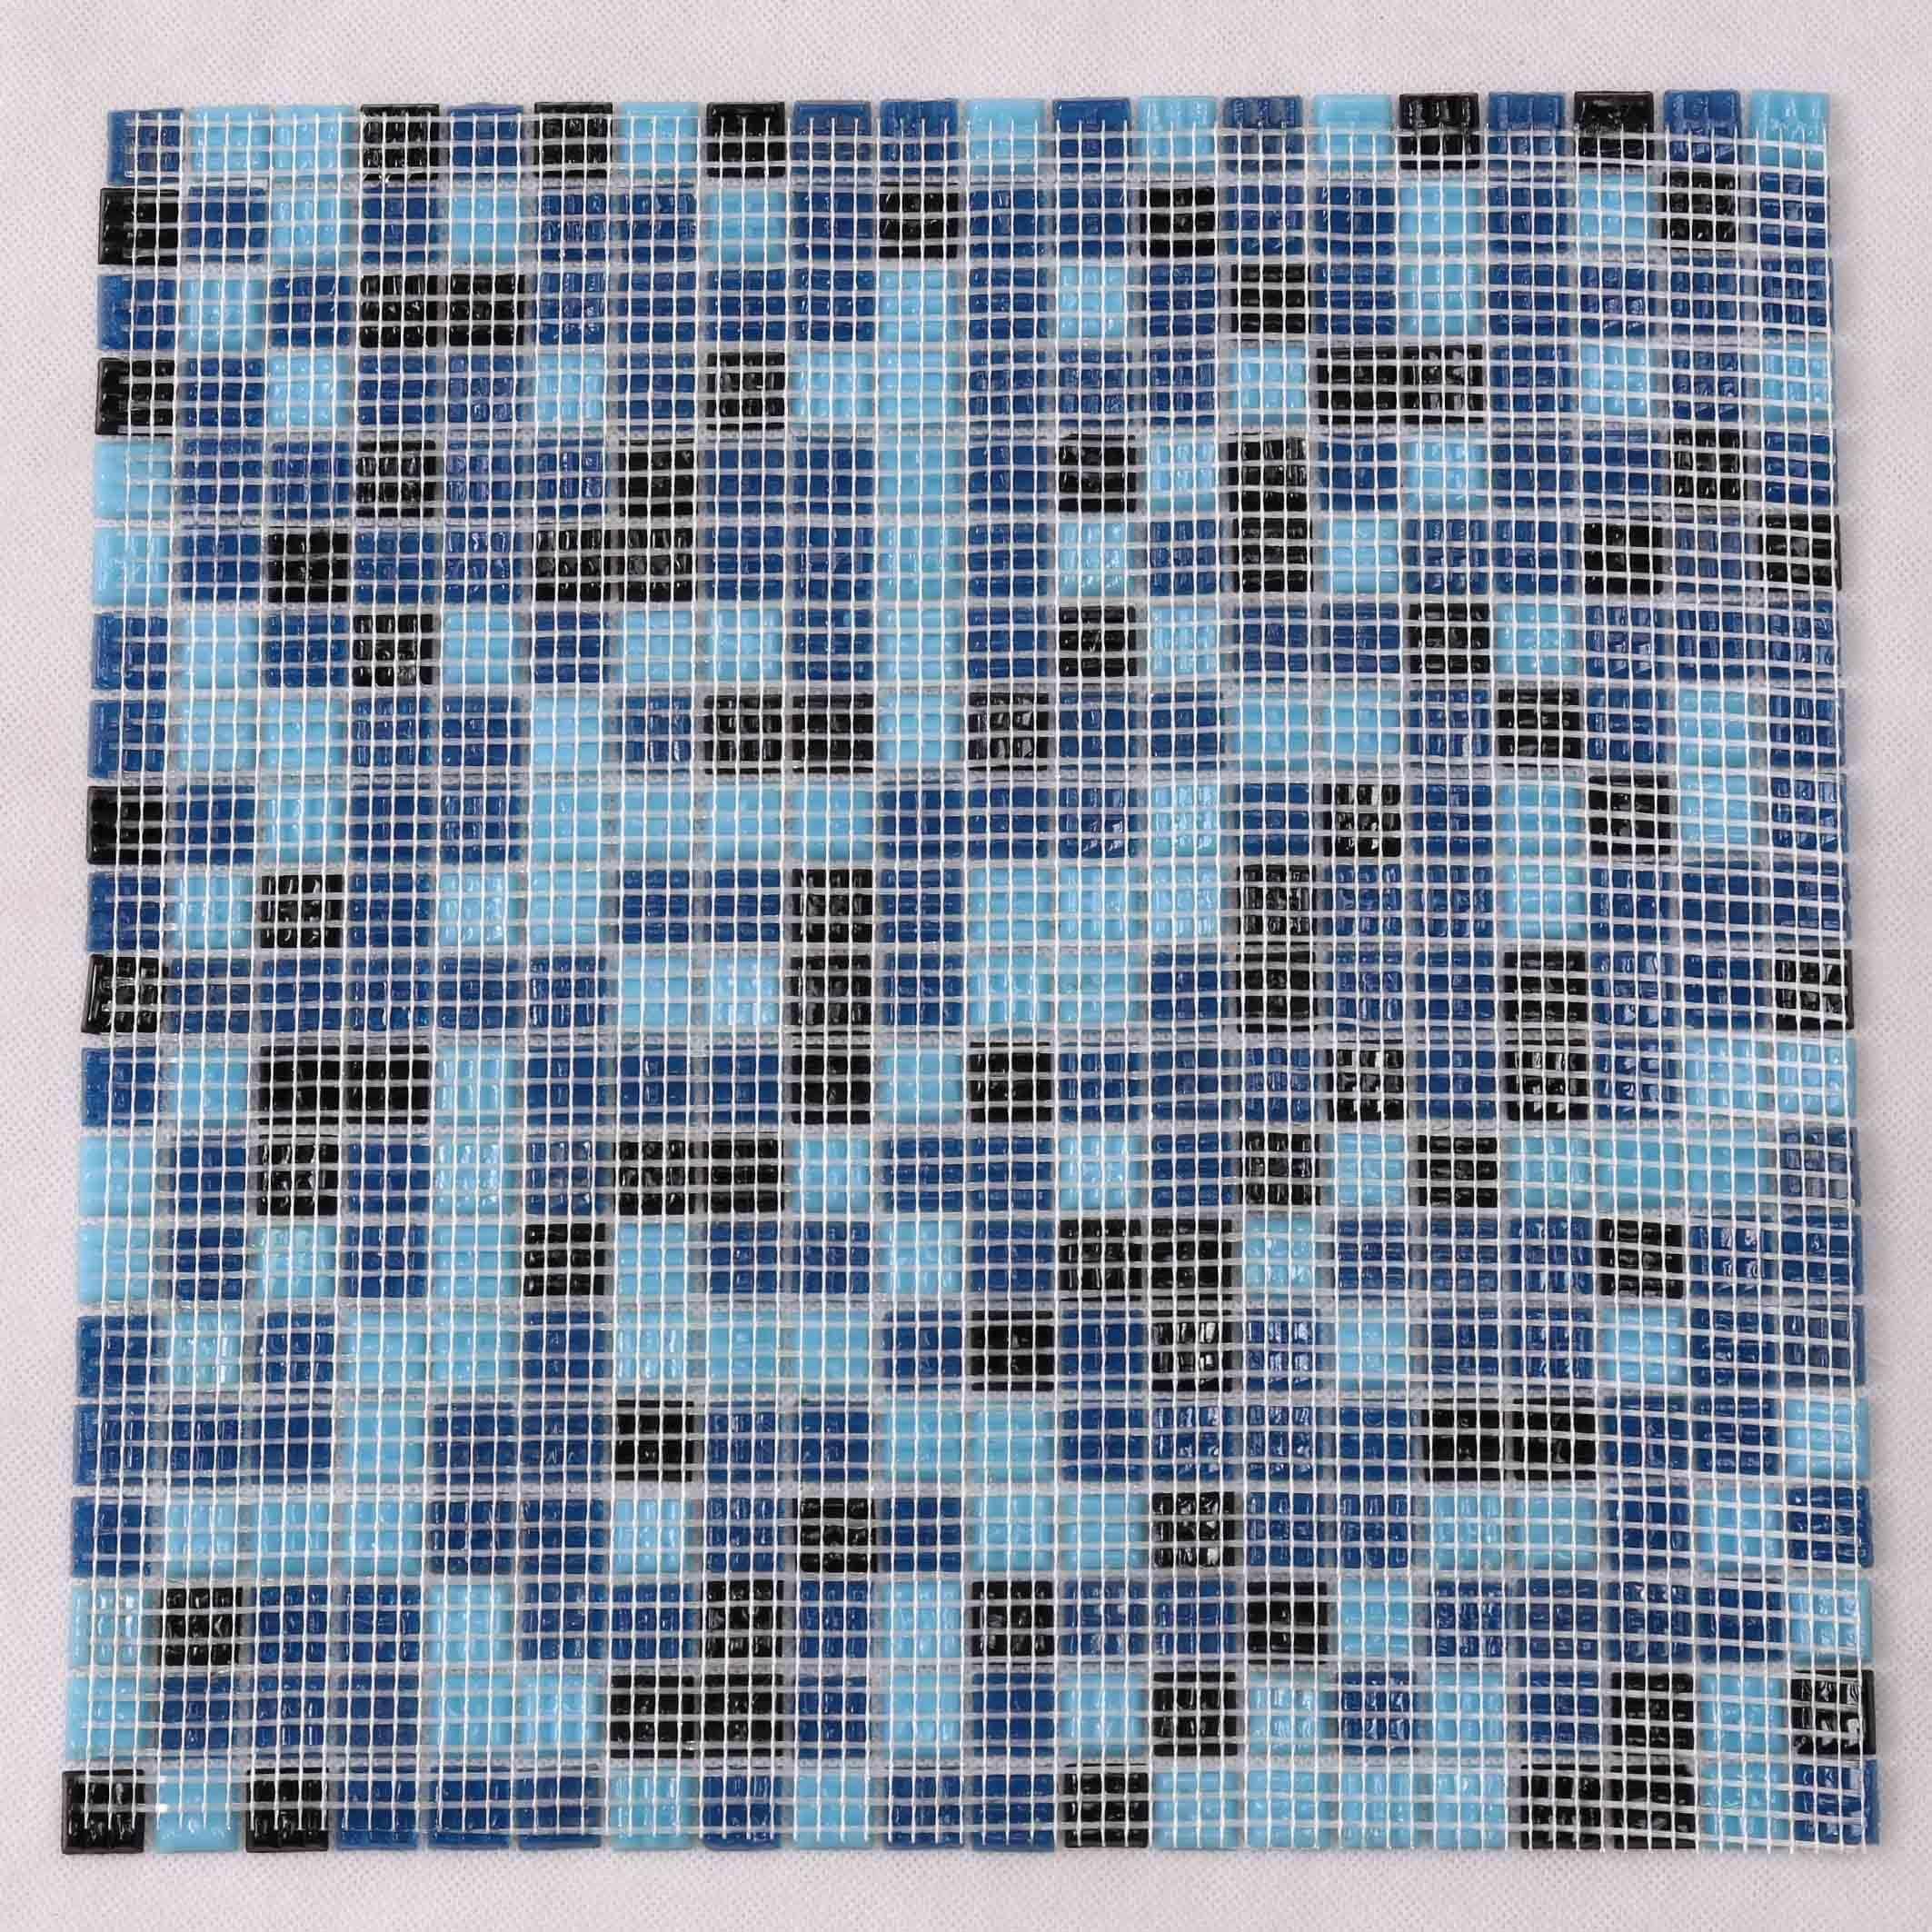 news-Heng Xing-Heng Xing ceramic grey pool tiles wholesale for fountain-img